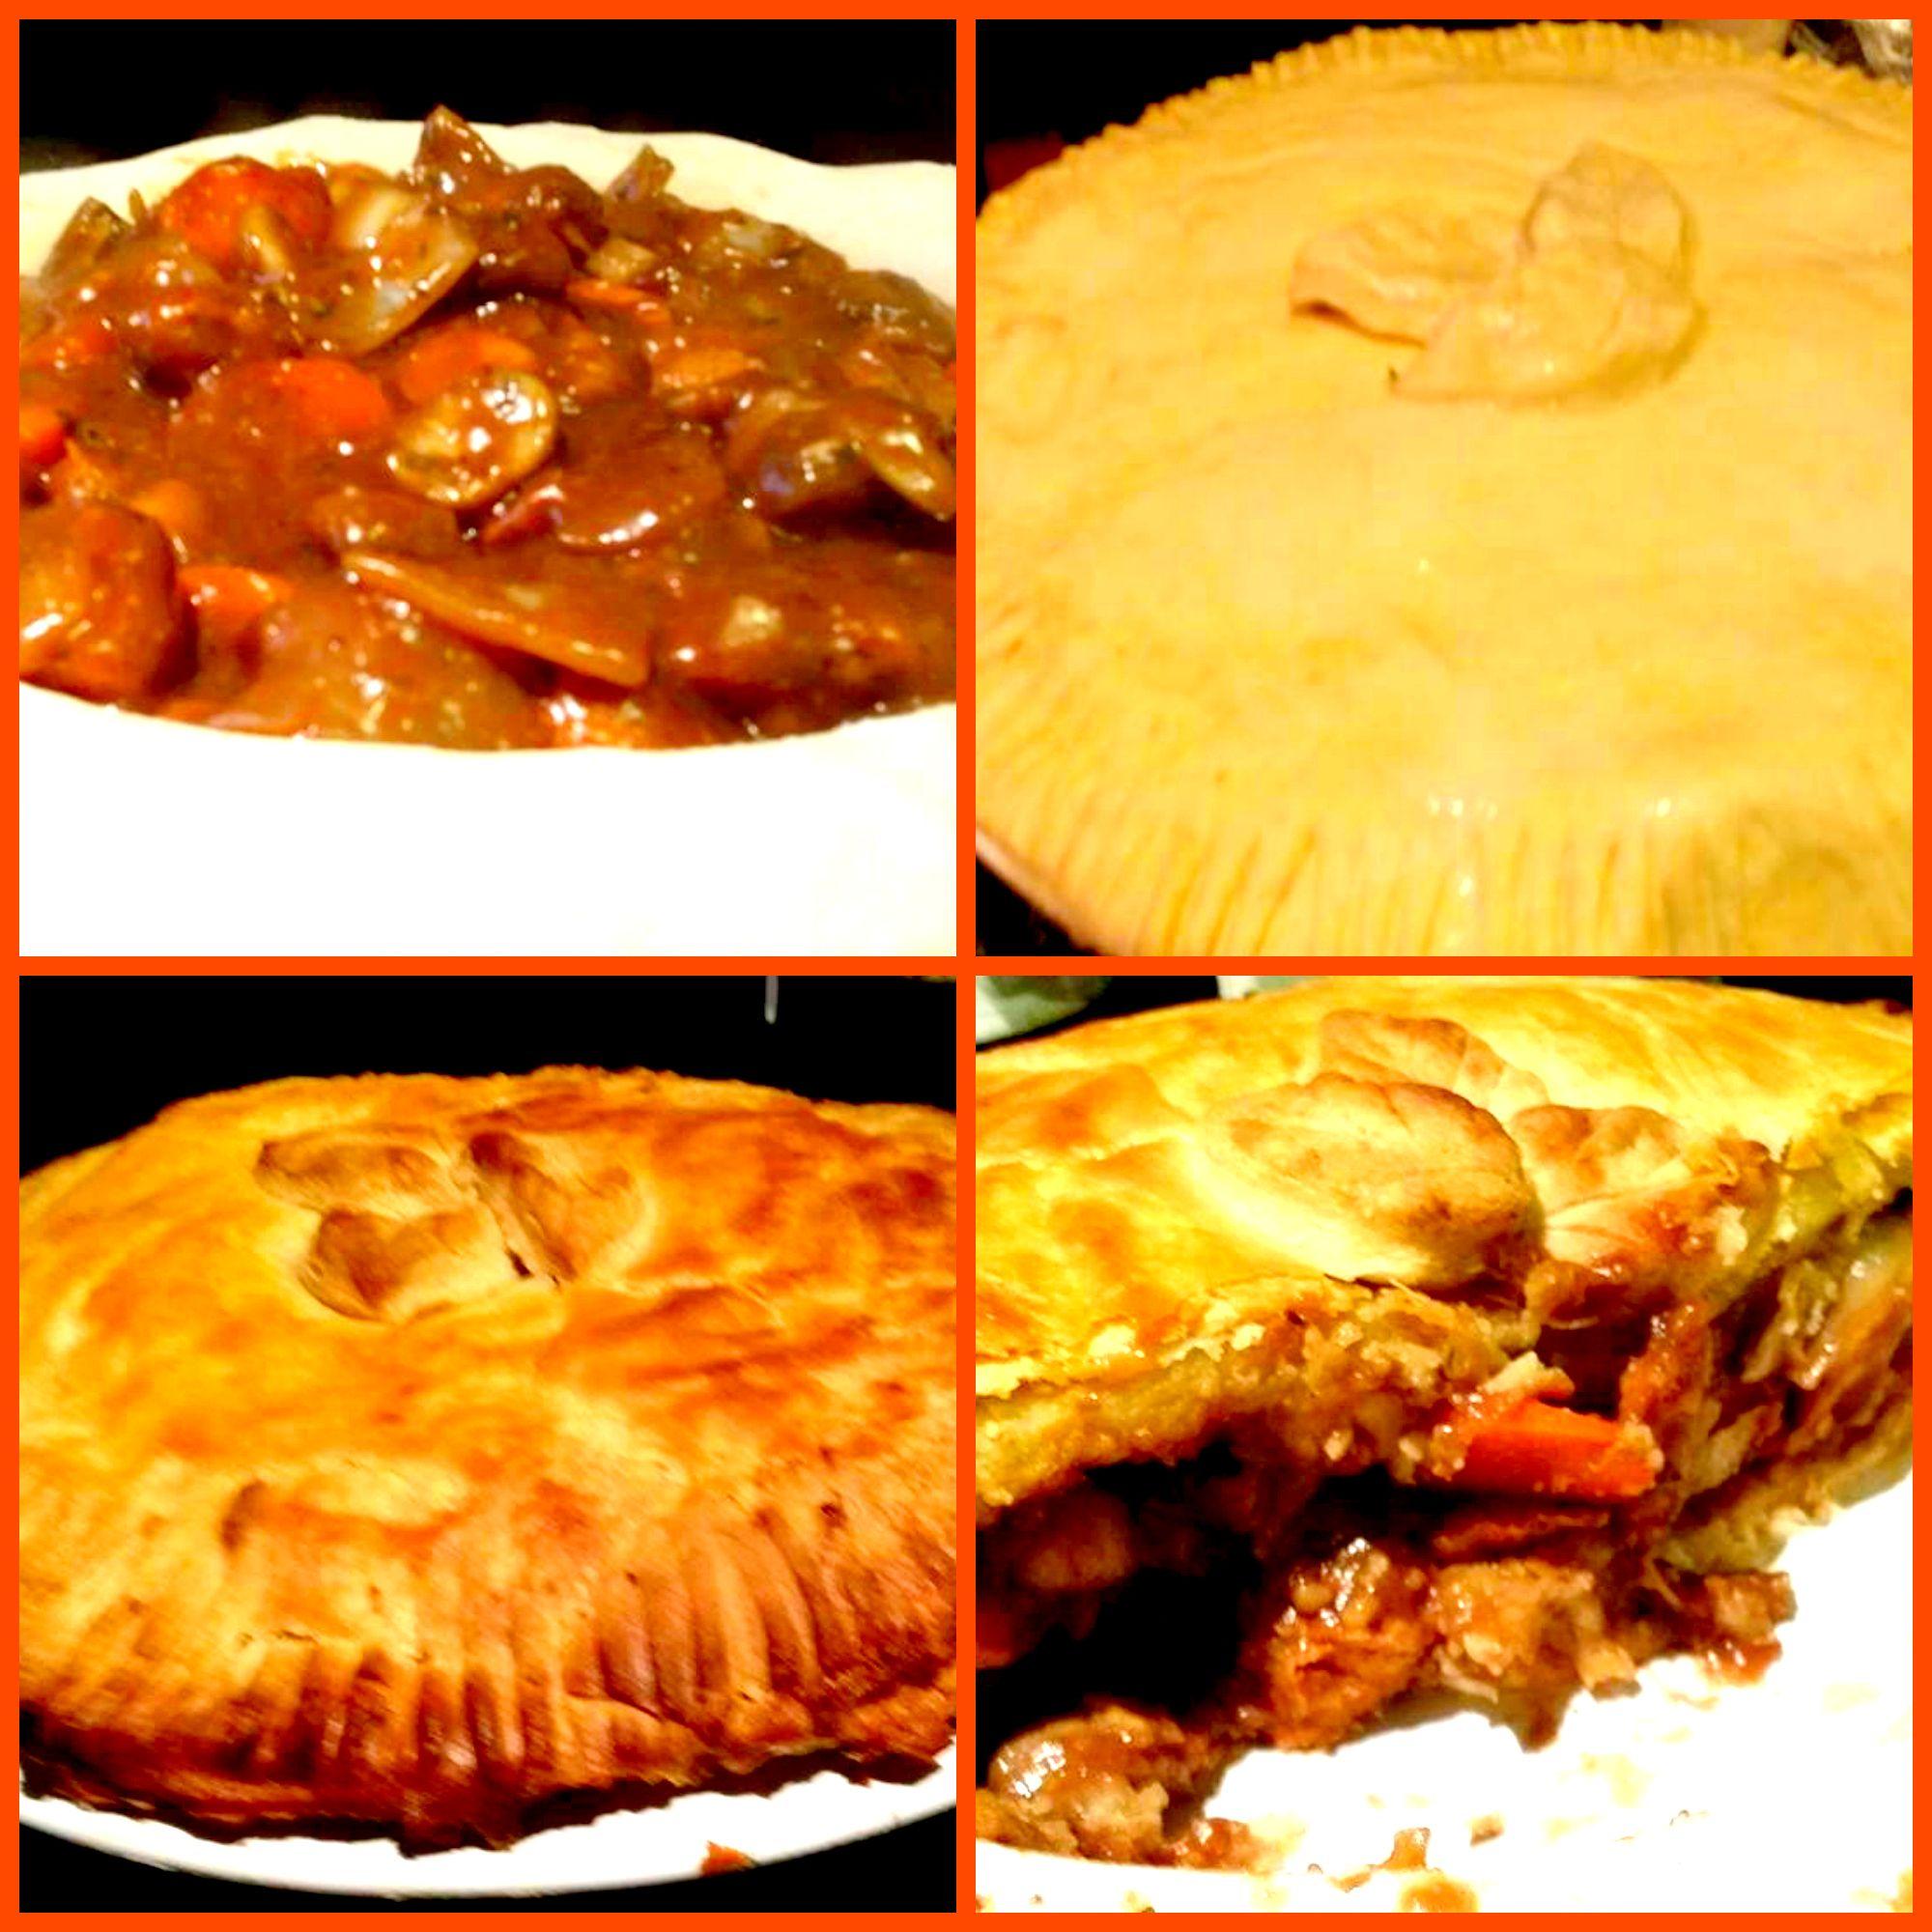 Vegan Steak and Ale Pie | Steak and ale, Ale pie, Vegan steak